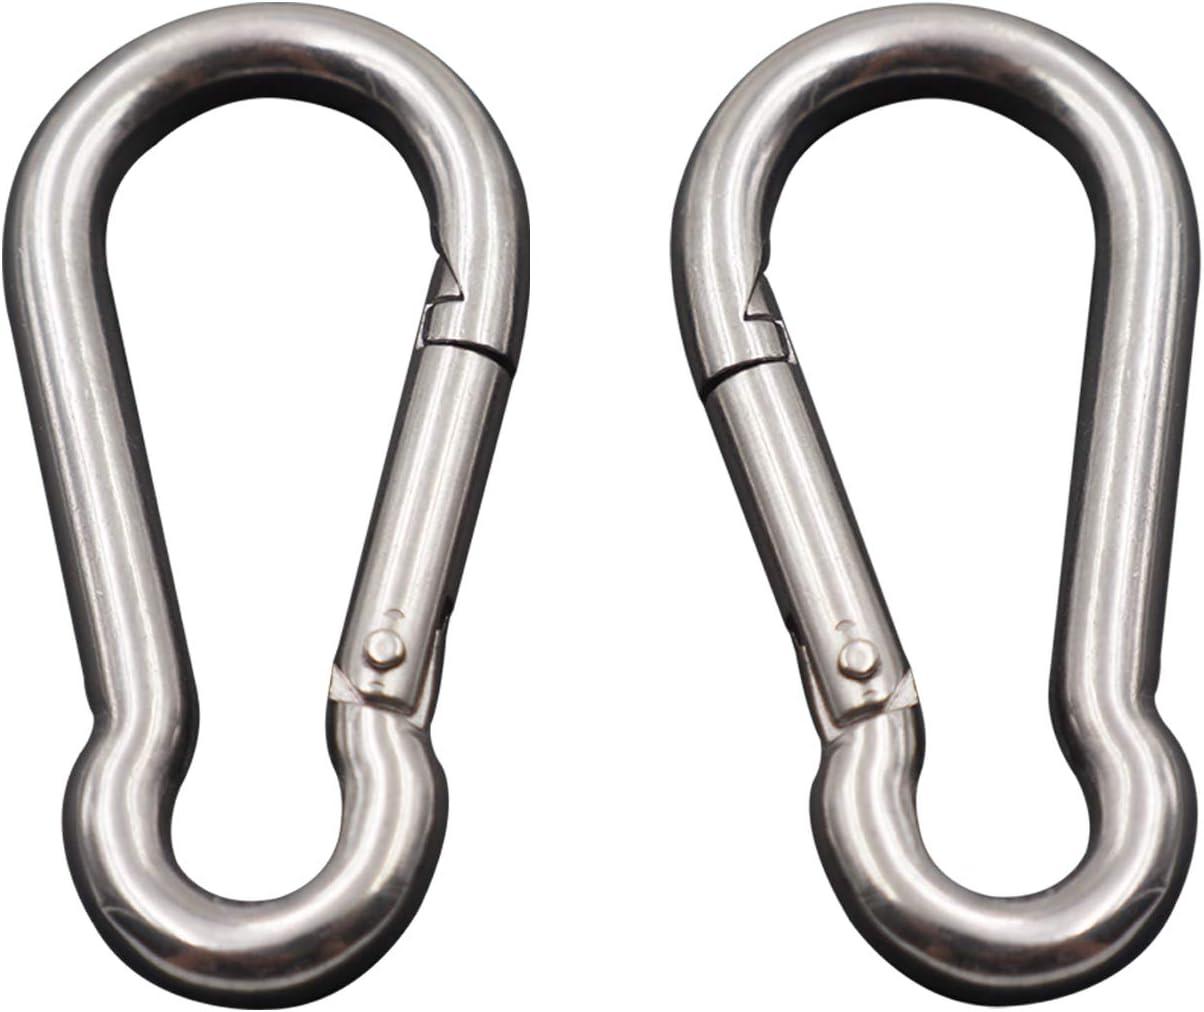 4 Pieces Hoomuda /M8 Super Heavy Duty Stainless Steel 316 Hook to Hook/Turnbuckle 4 PC M8 Hook to Hook